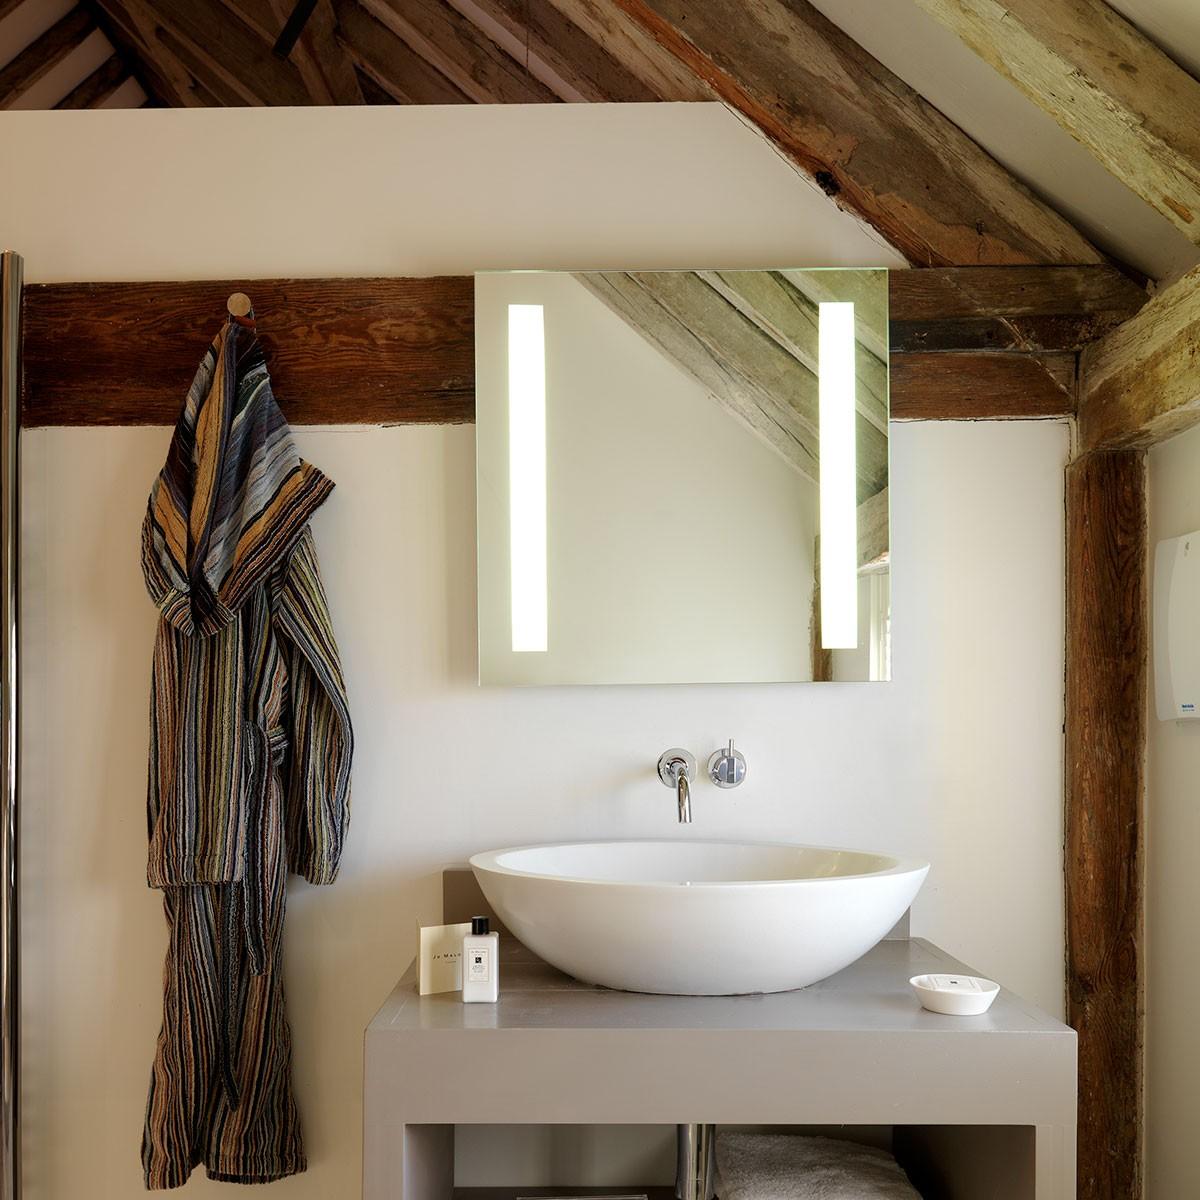 Bathroom Mirror Lights Uk: Astro Galaxy Bathroom Mirror Light At UK Electrical Supplies